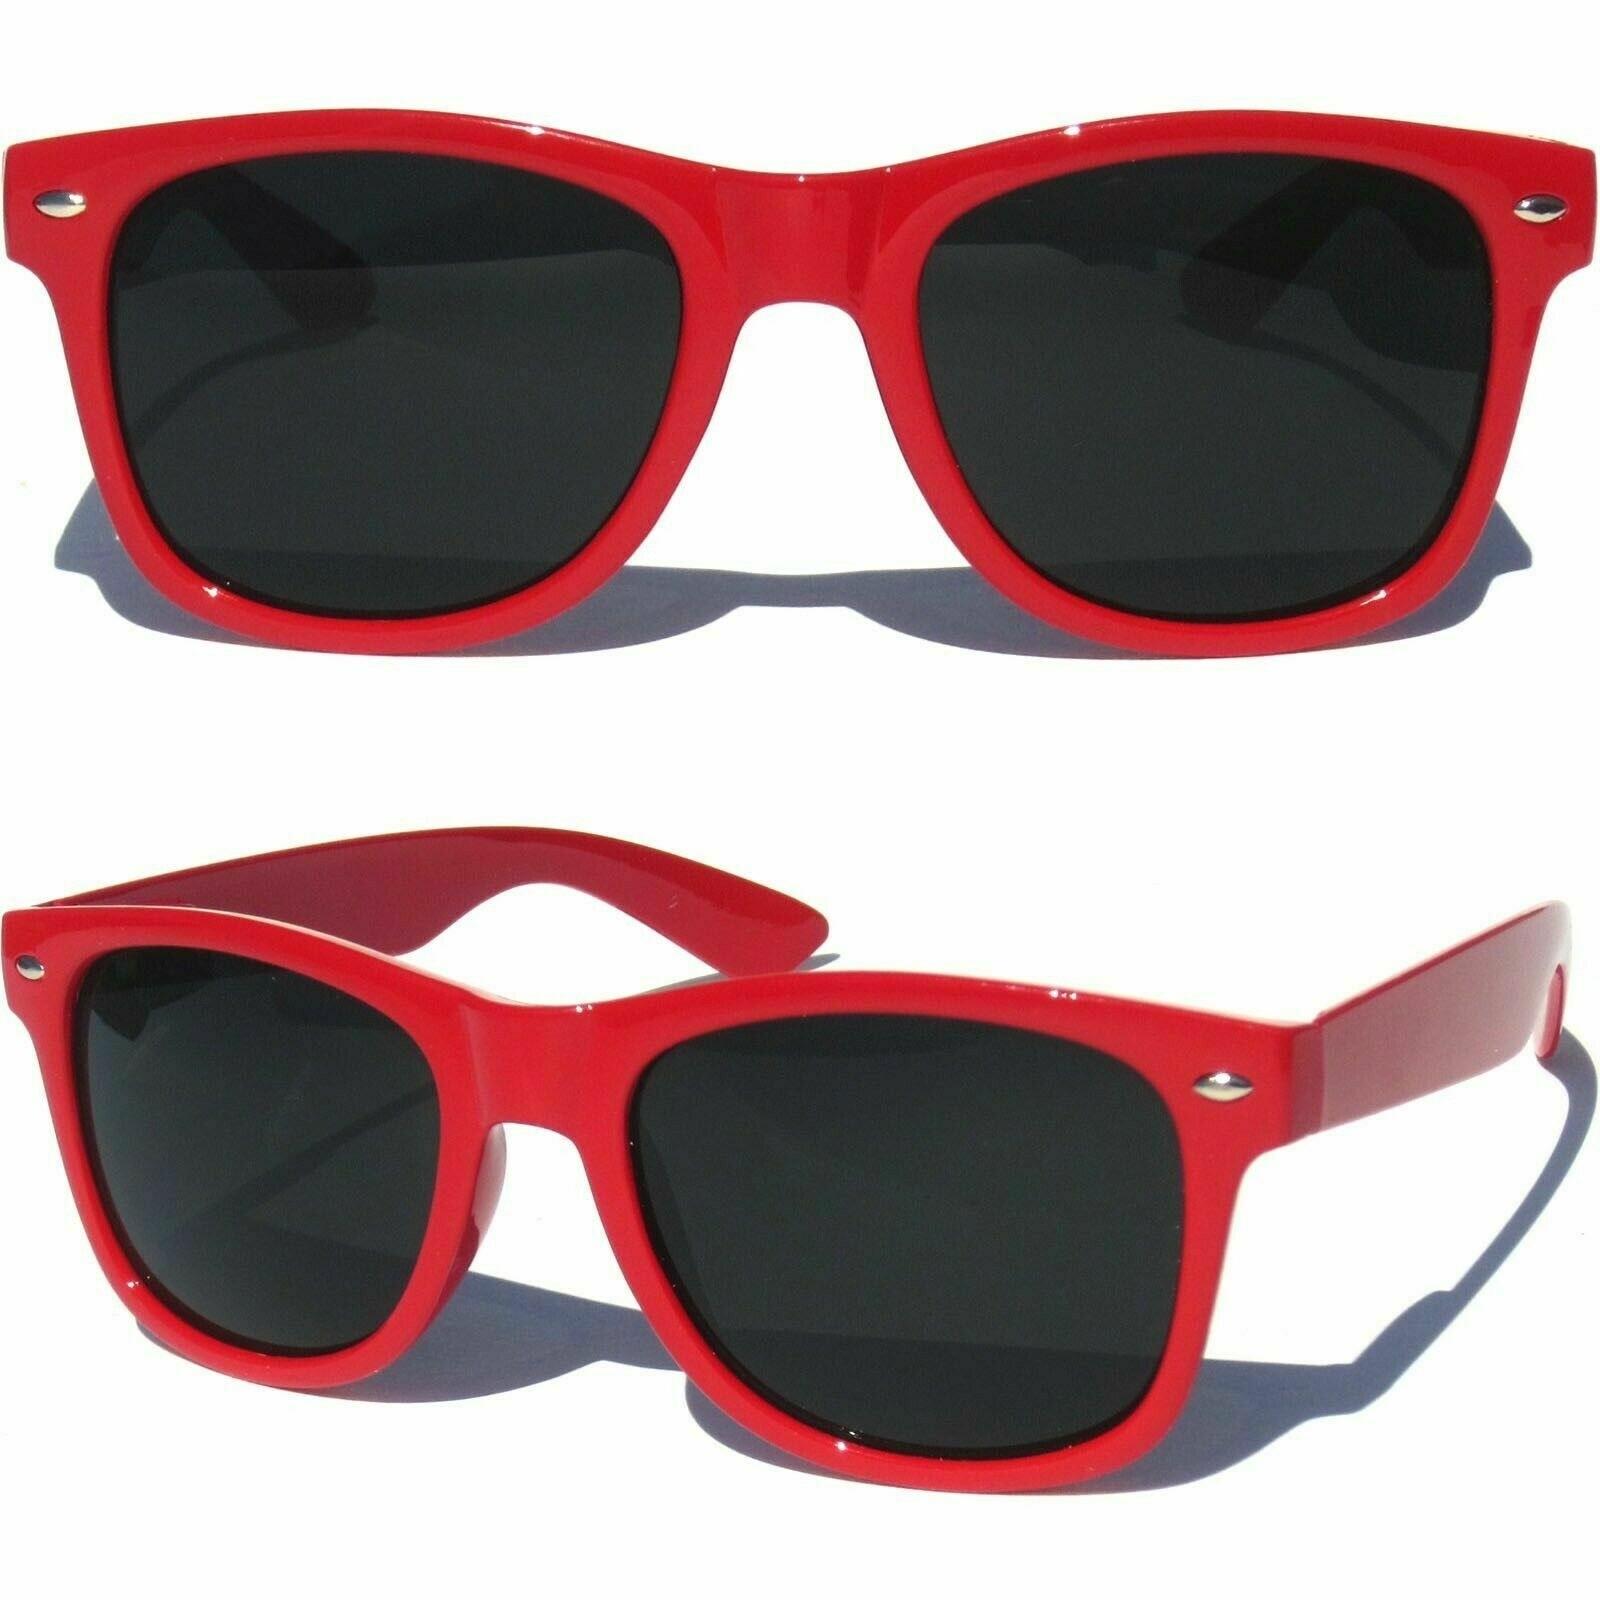 Red wayfarer glasses